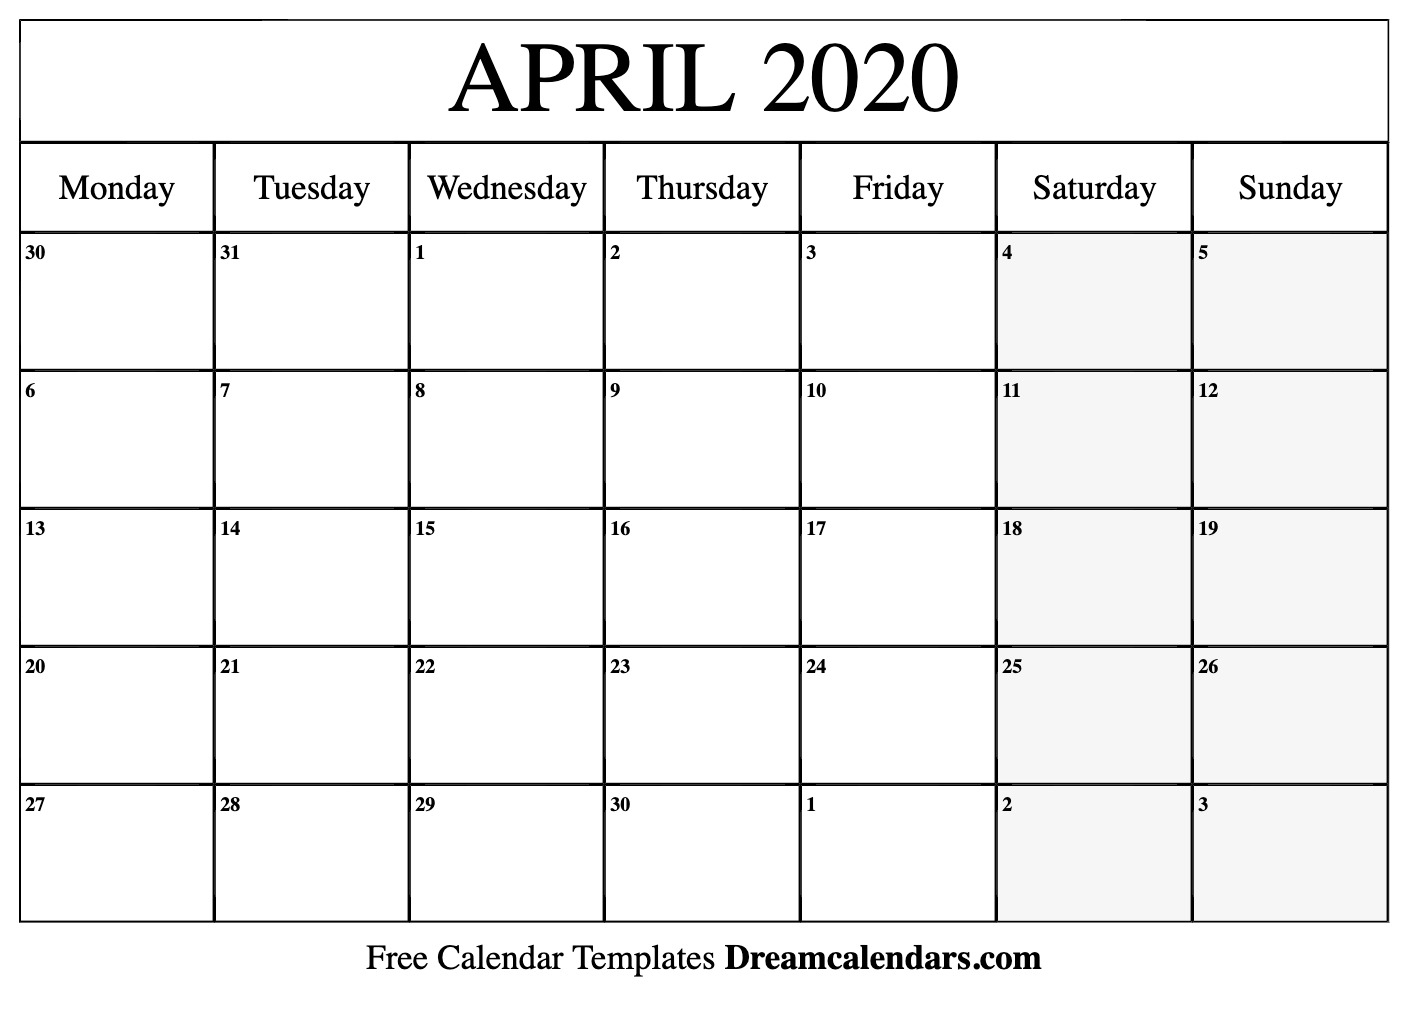 Printable April 2020 Calendar with 2020Printable Monday Through Sunday Calendars